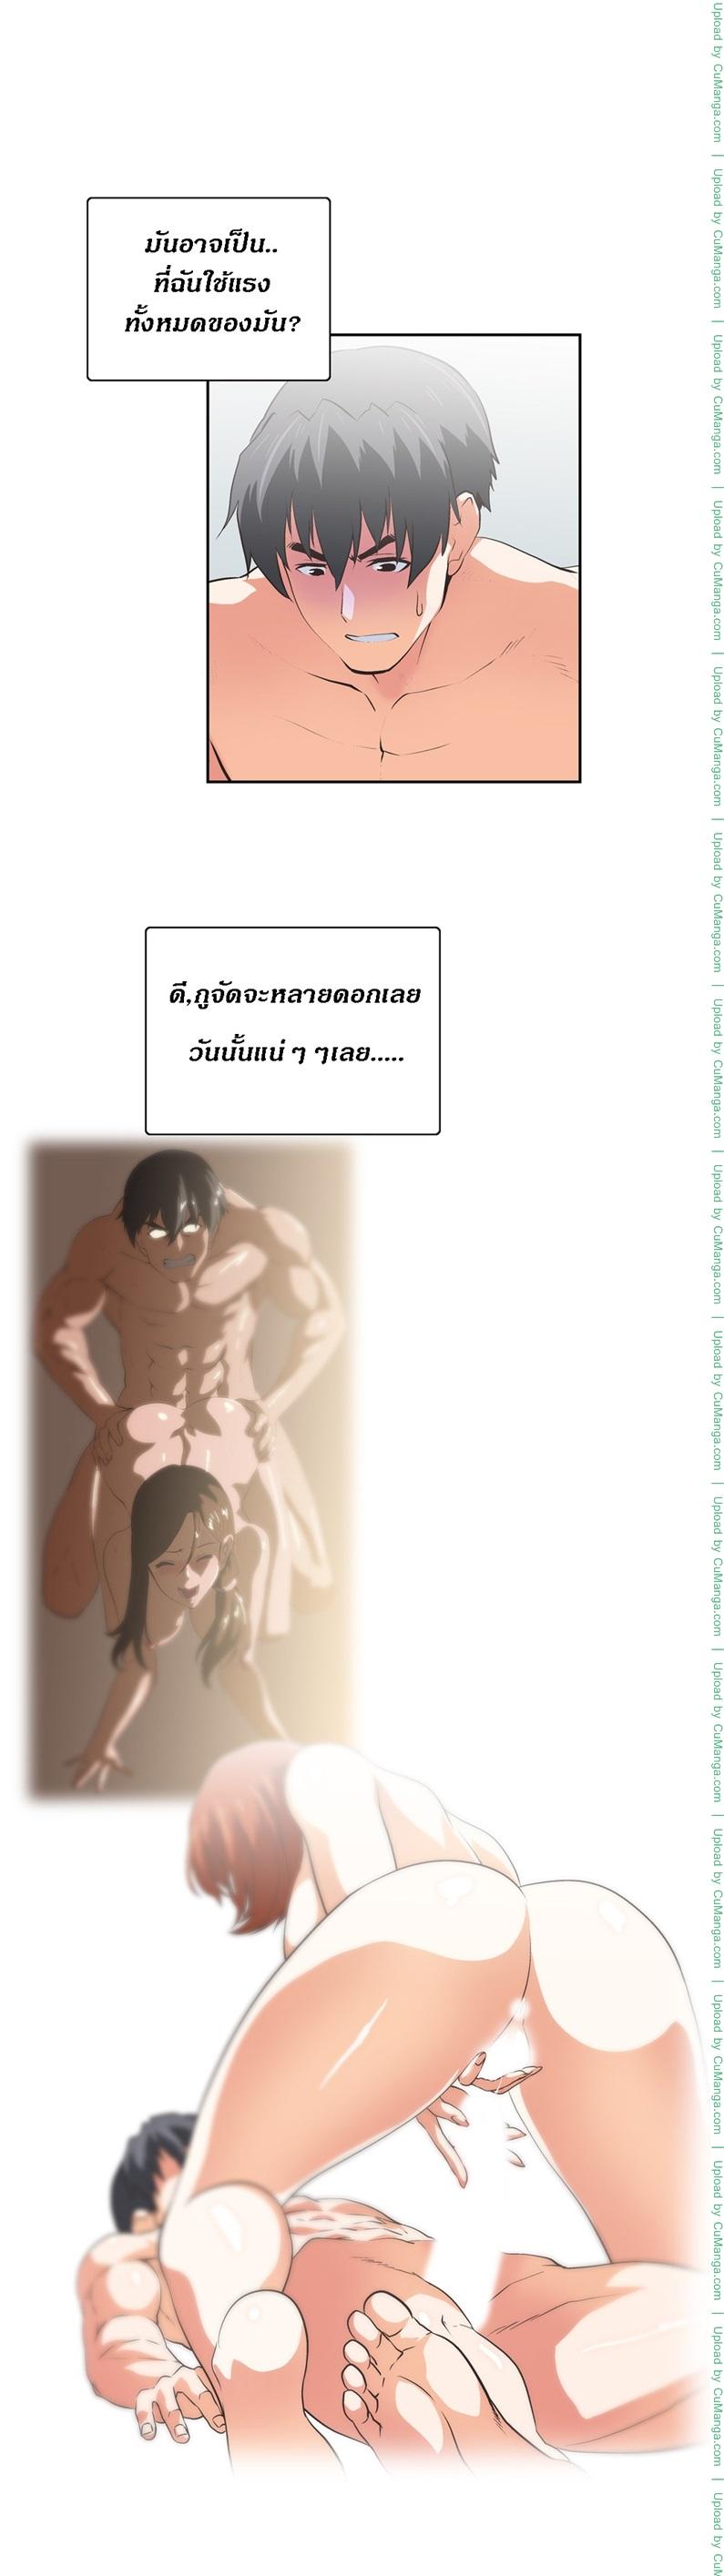 SStudy 46 - หน้า 3